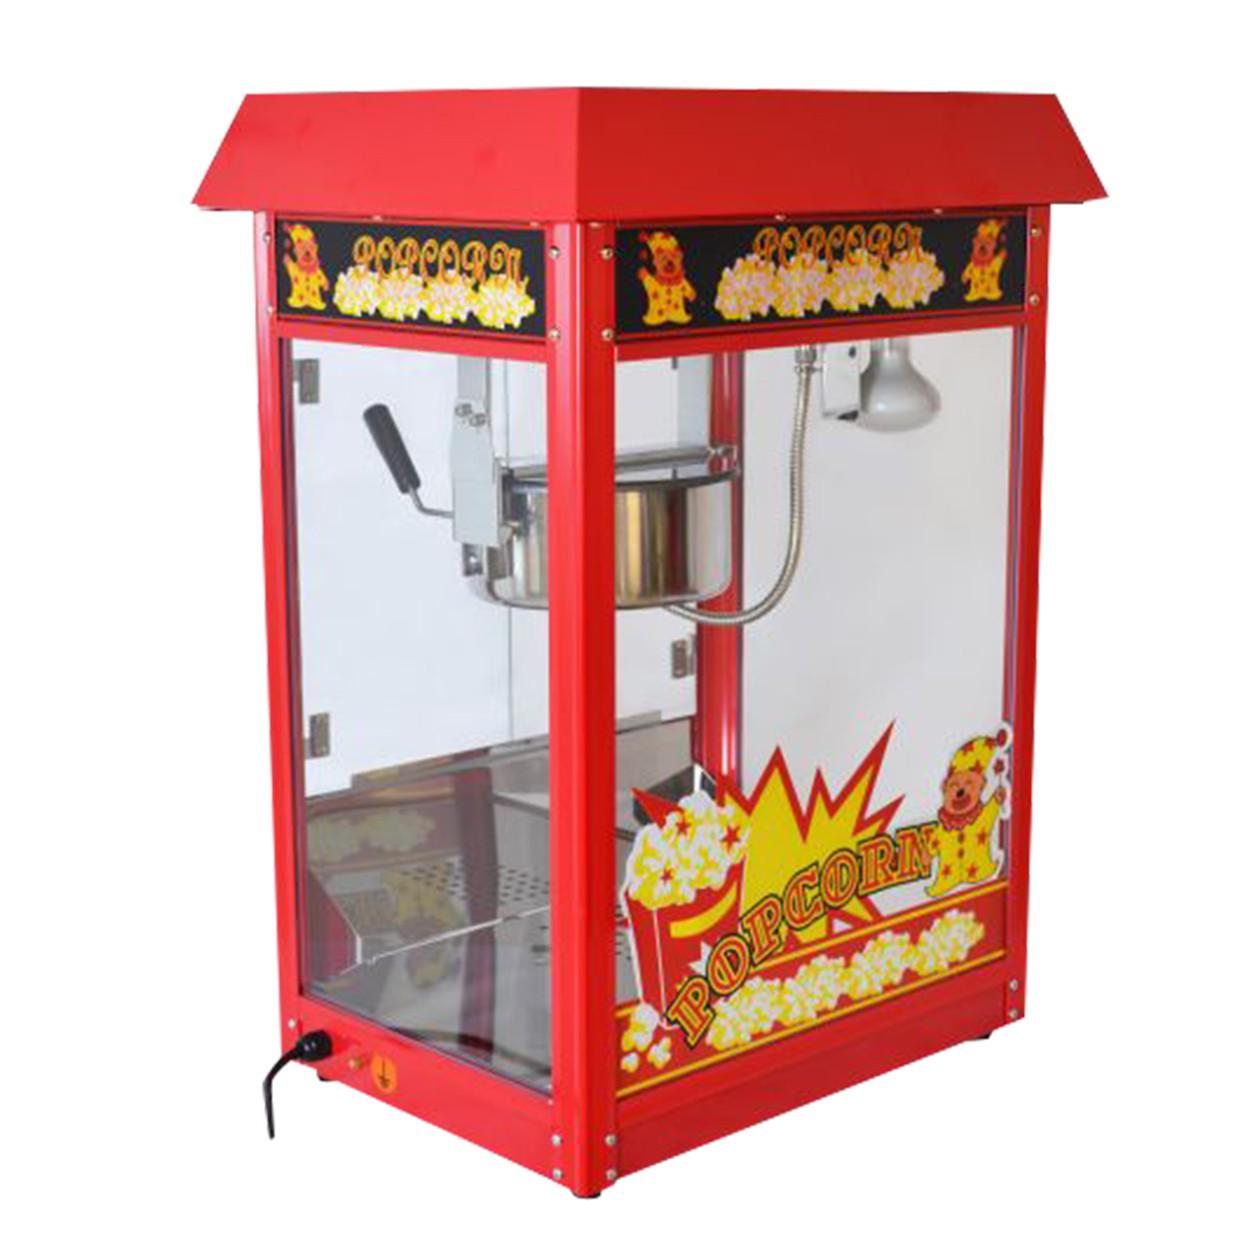 popcornmaschine popcornmaker mit wagen edelstahltopf w rmeplatte. Black Bedroom Furniture Sets. Home Design Ideas